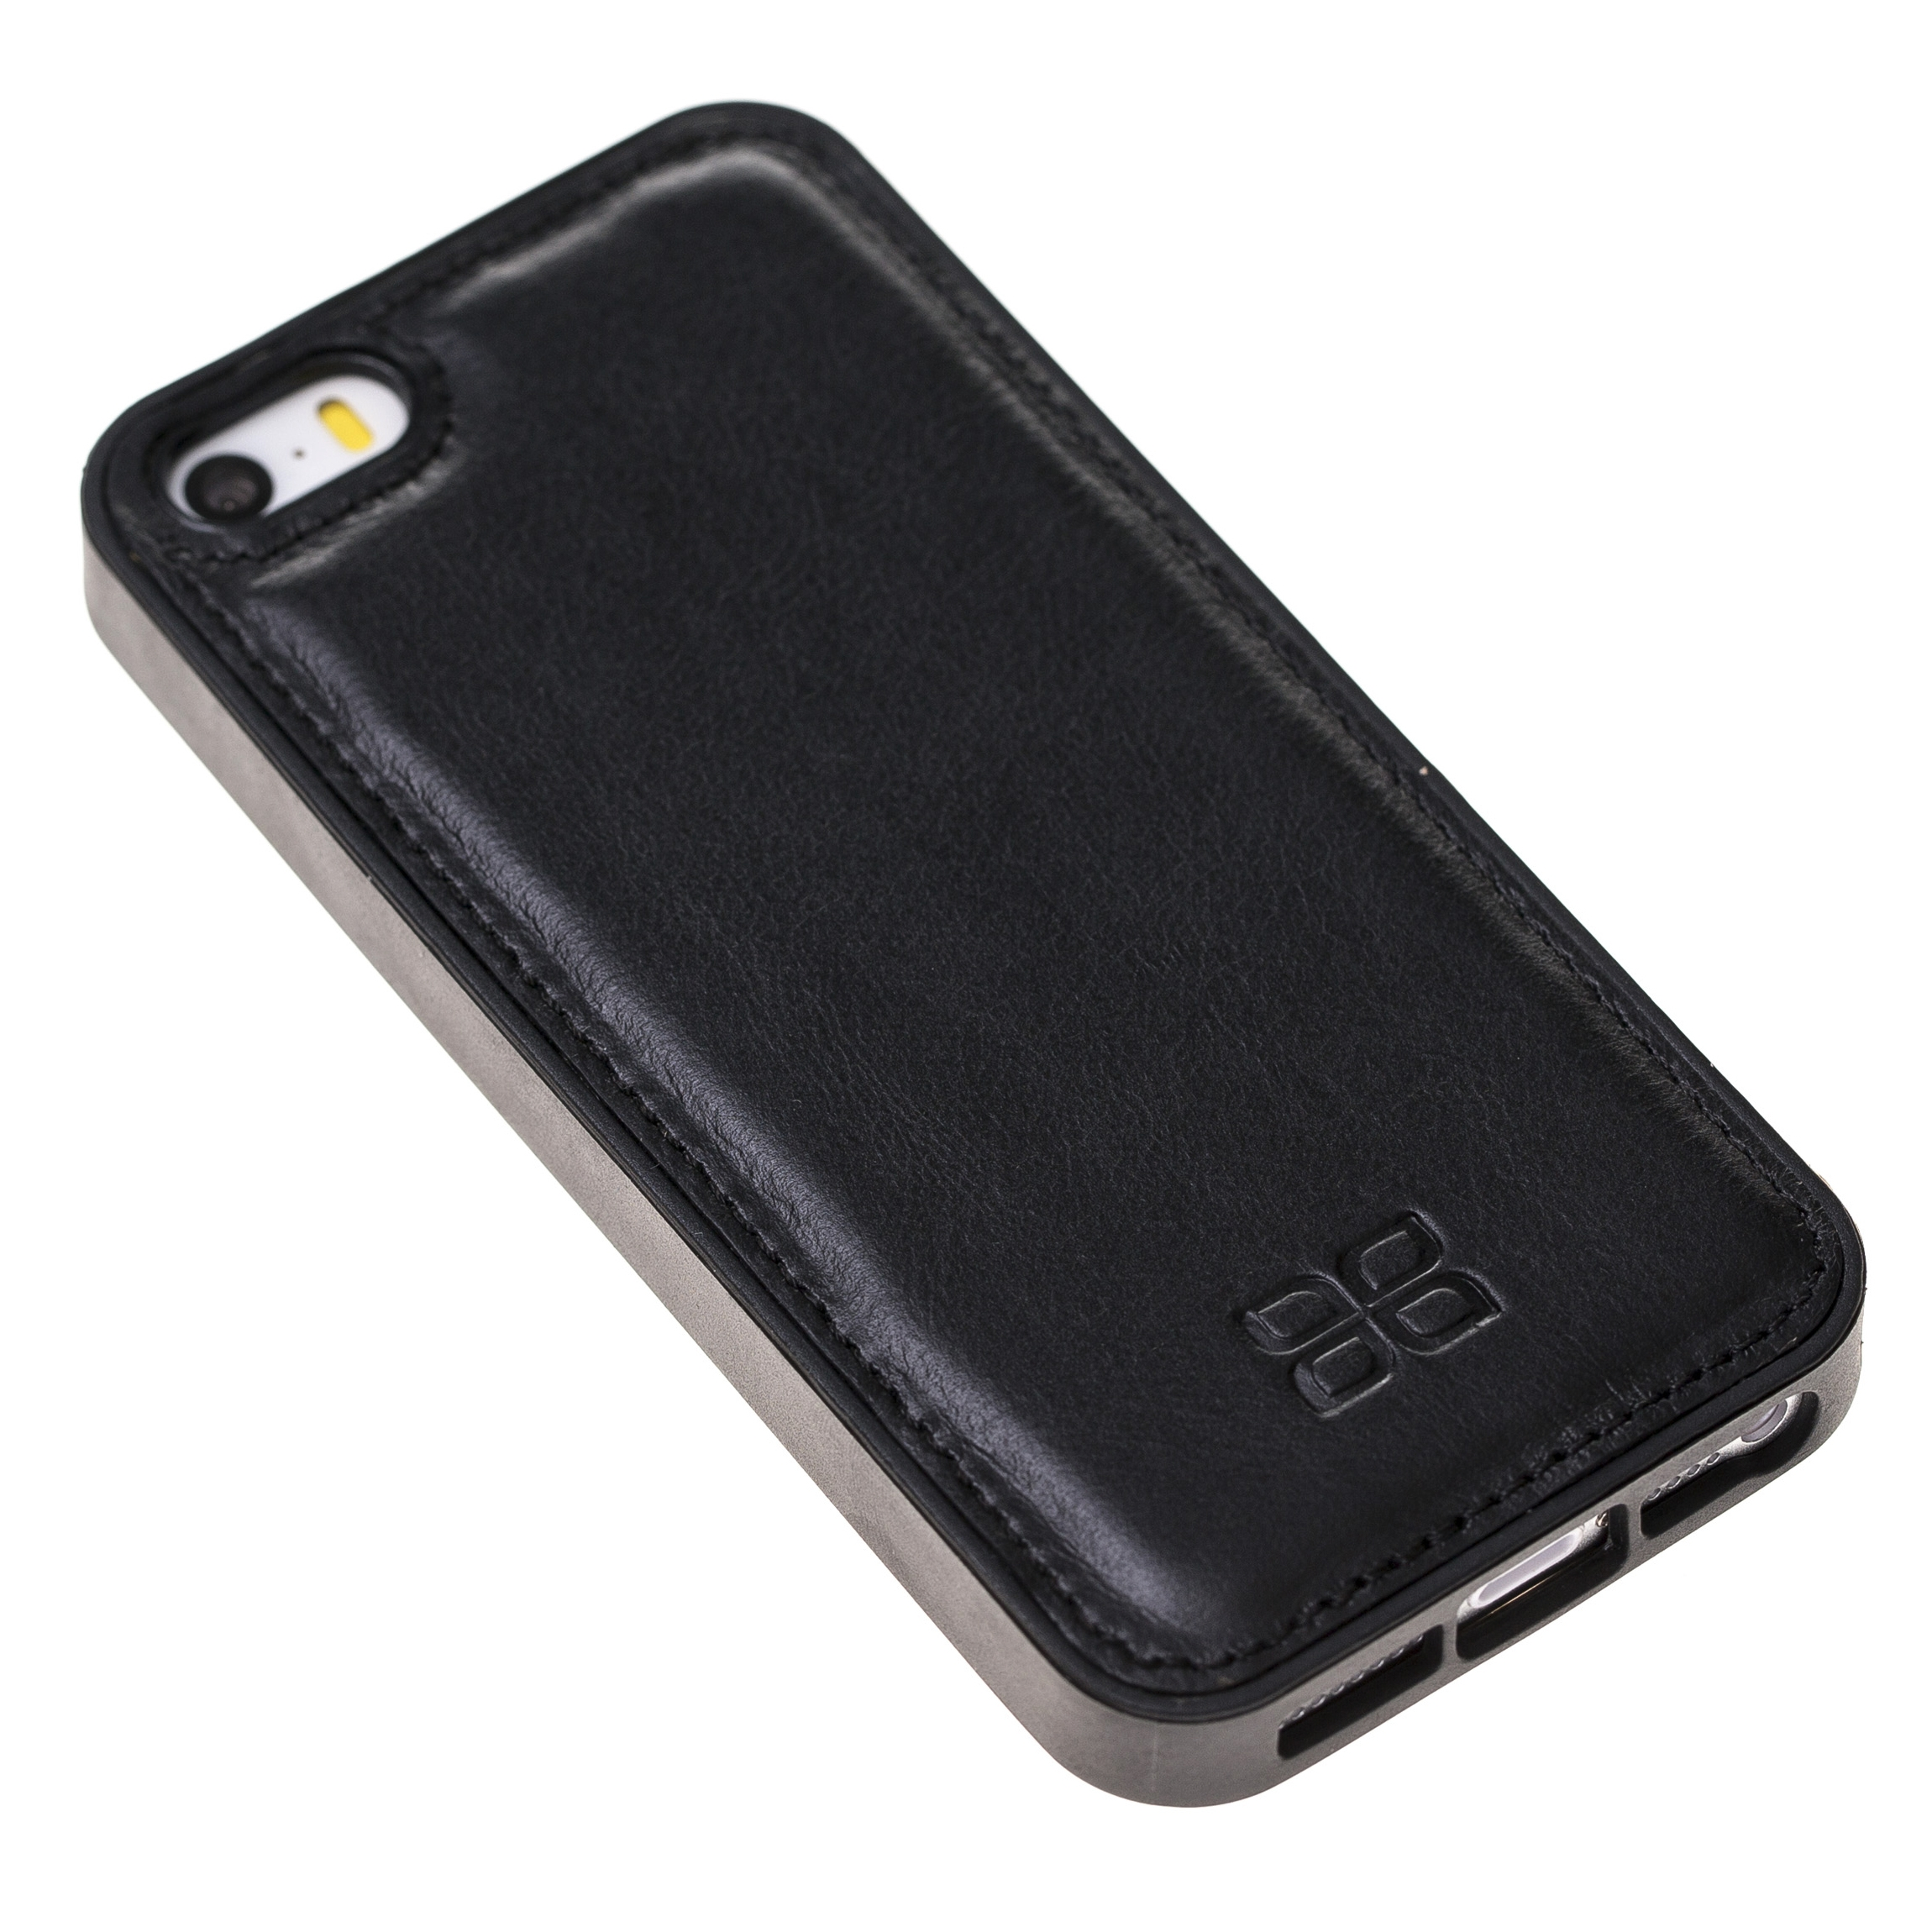 Чехол FlexCover Bouletta Черный RST1 для iPhone 5/5S/SE